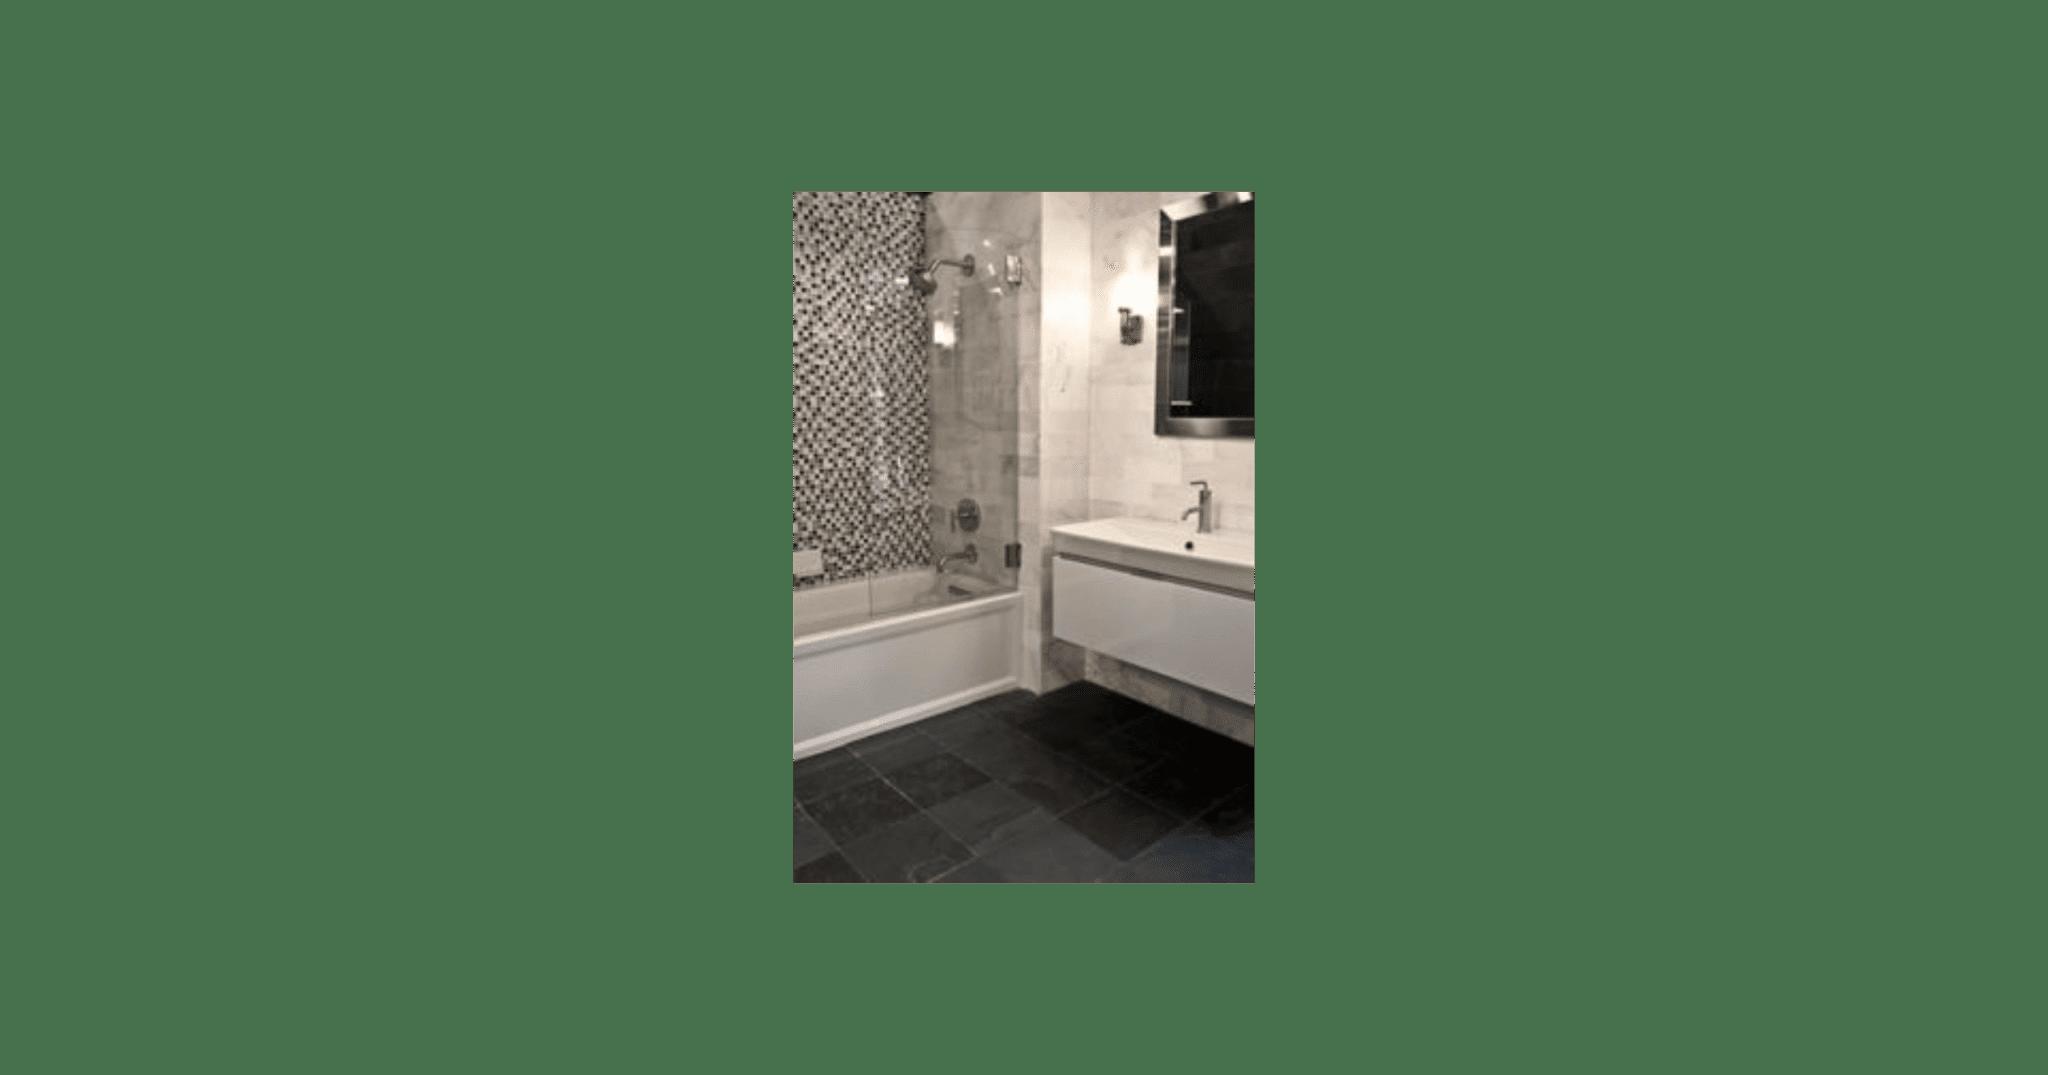 Black Slate Floor Tile 12x12 In - Luxury Bathroom Products